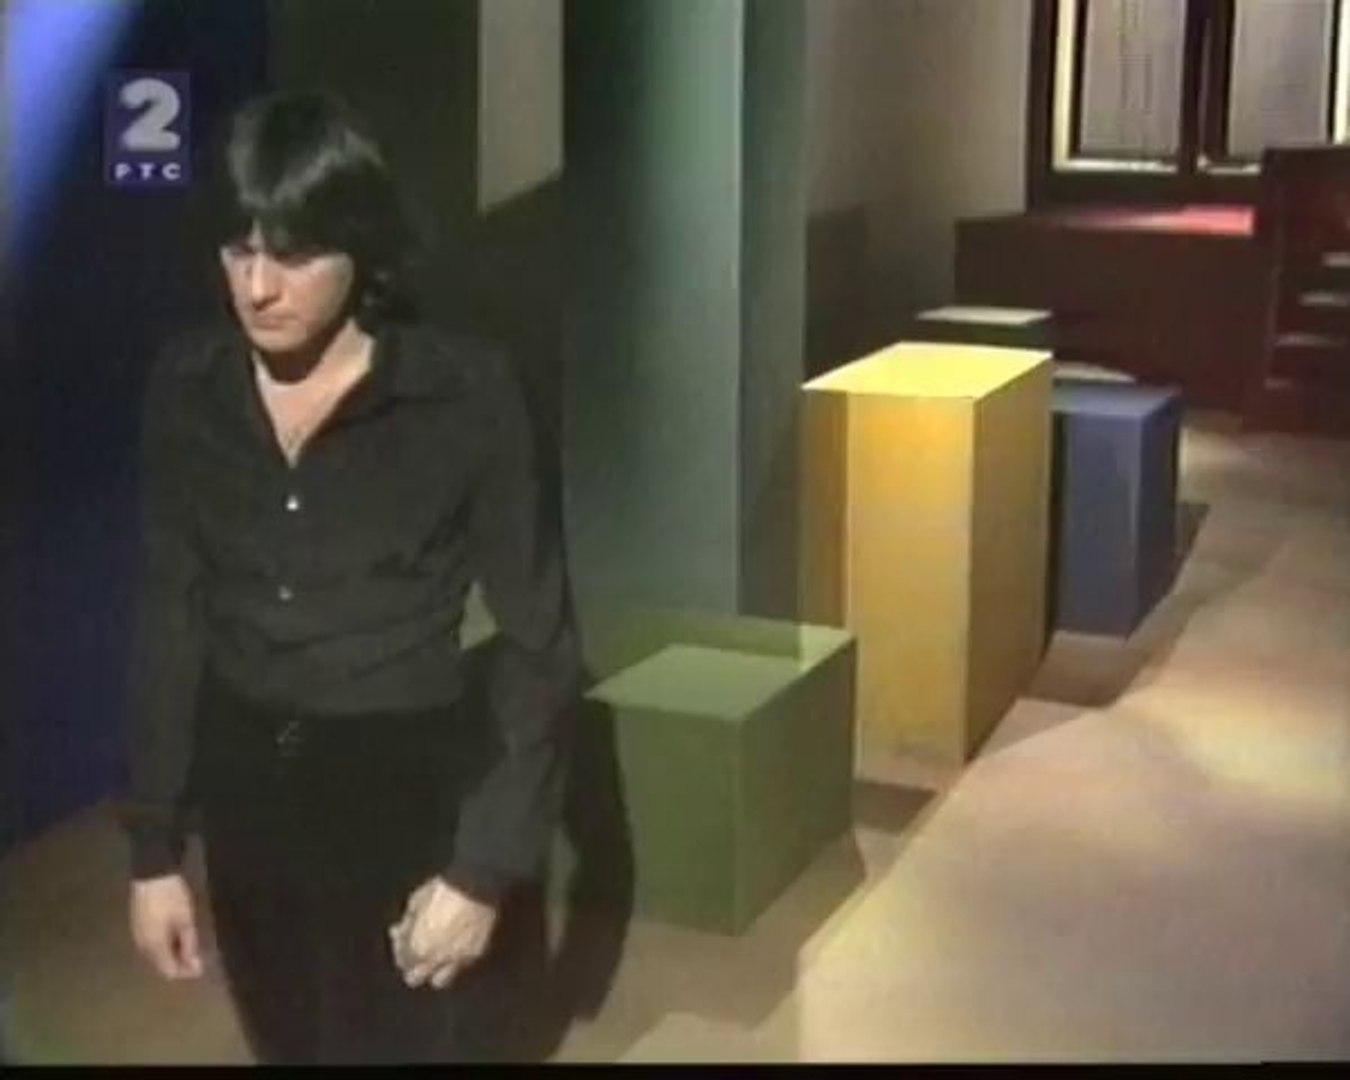 Zdravko Colic - Voljela se nekad srca dva (1974)